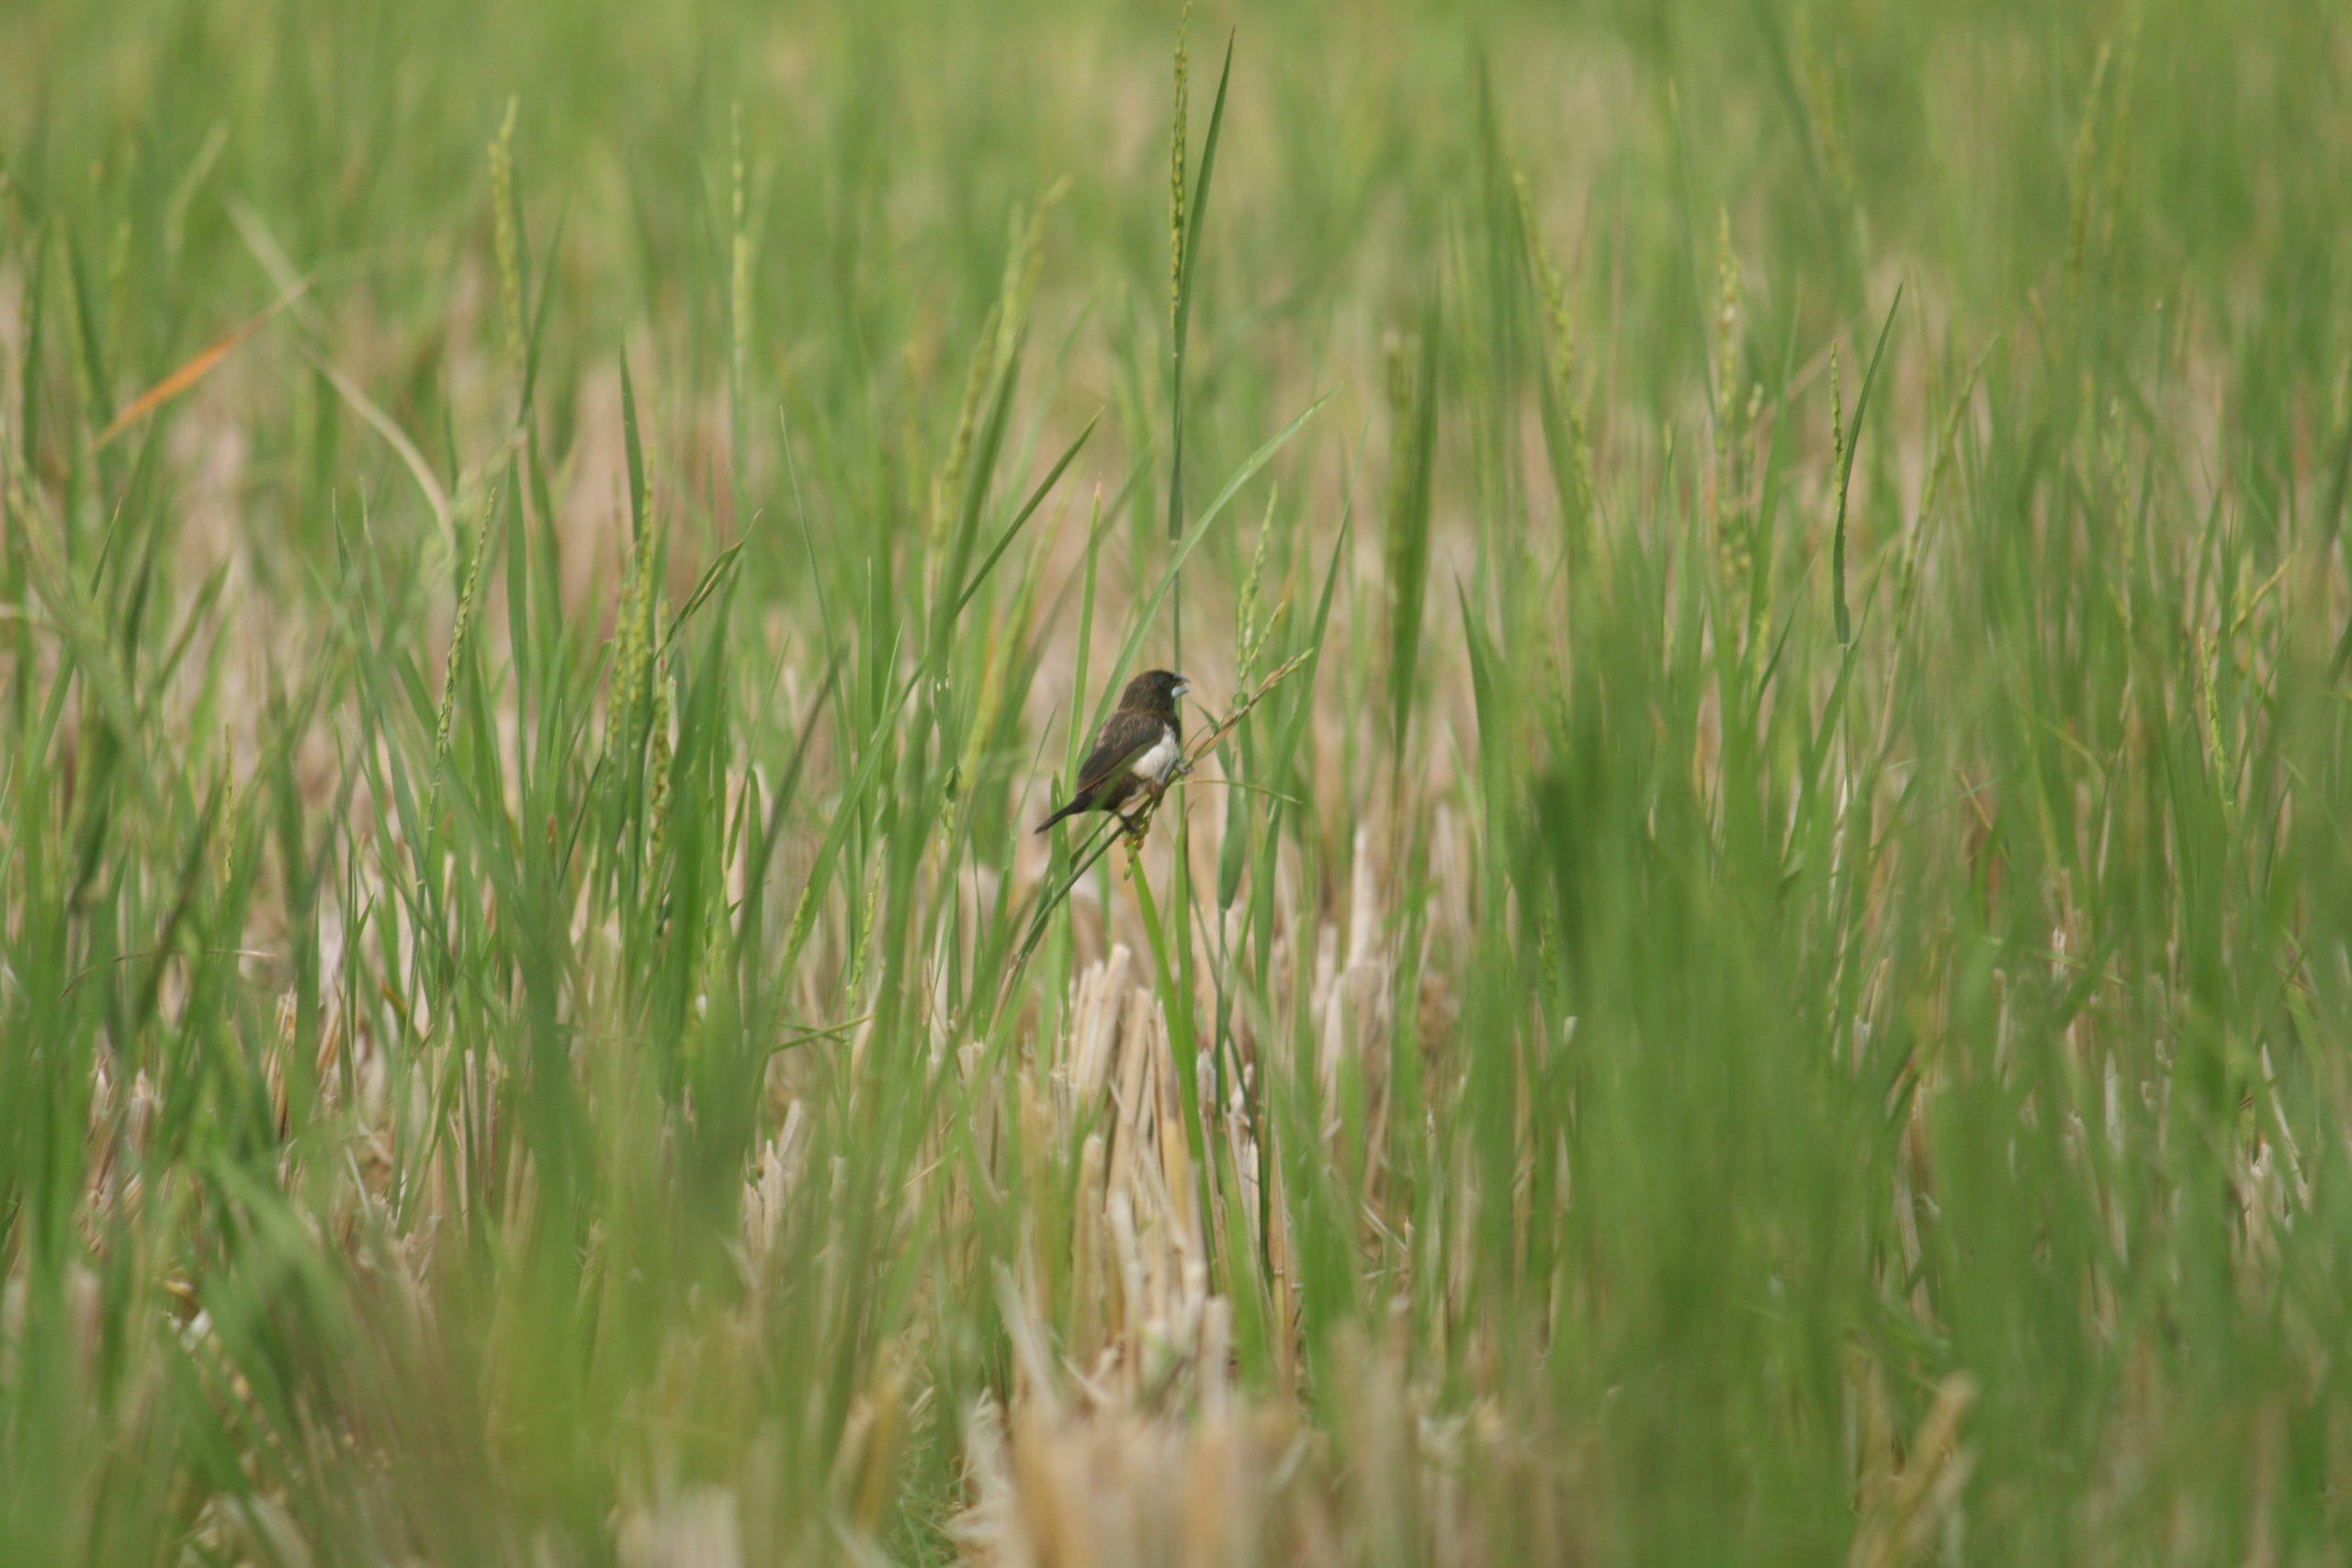 A bird in a paddy field